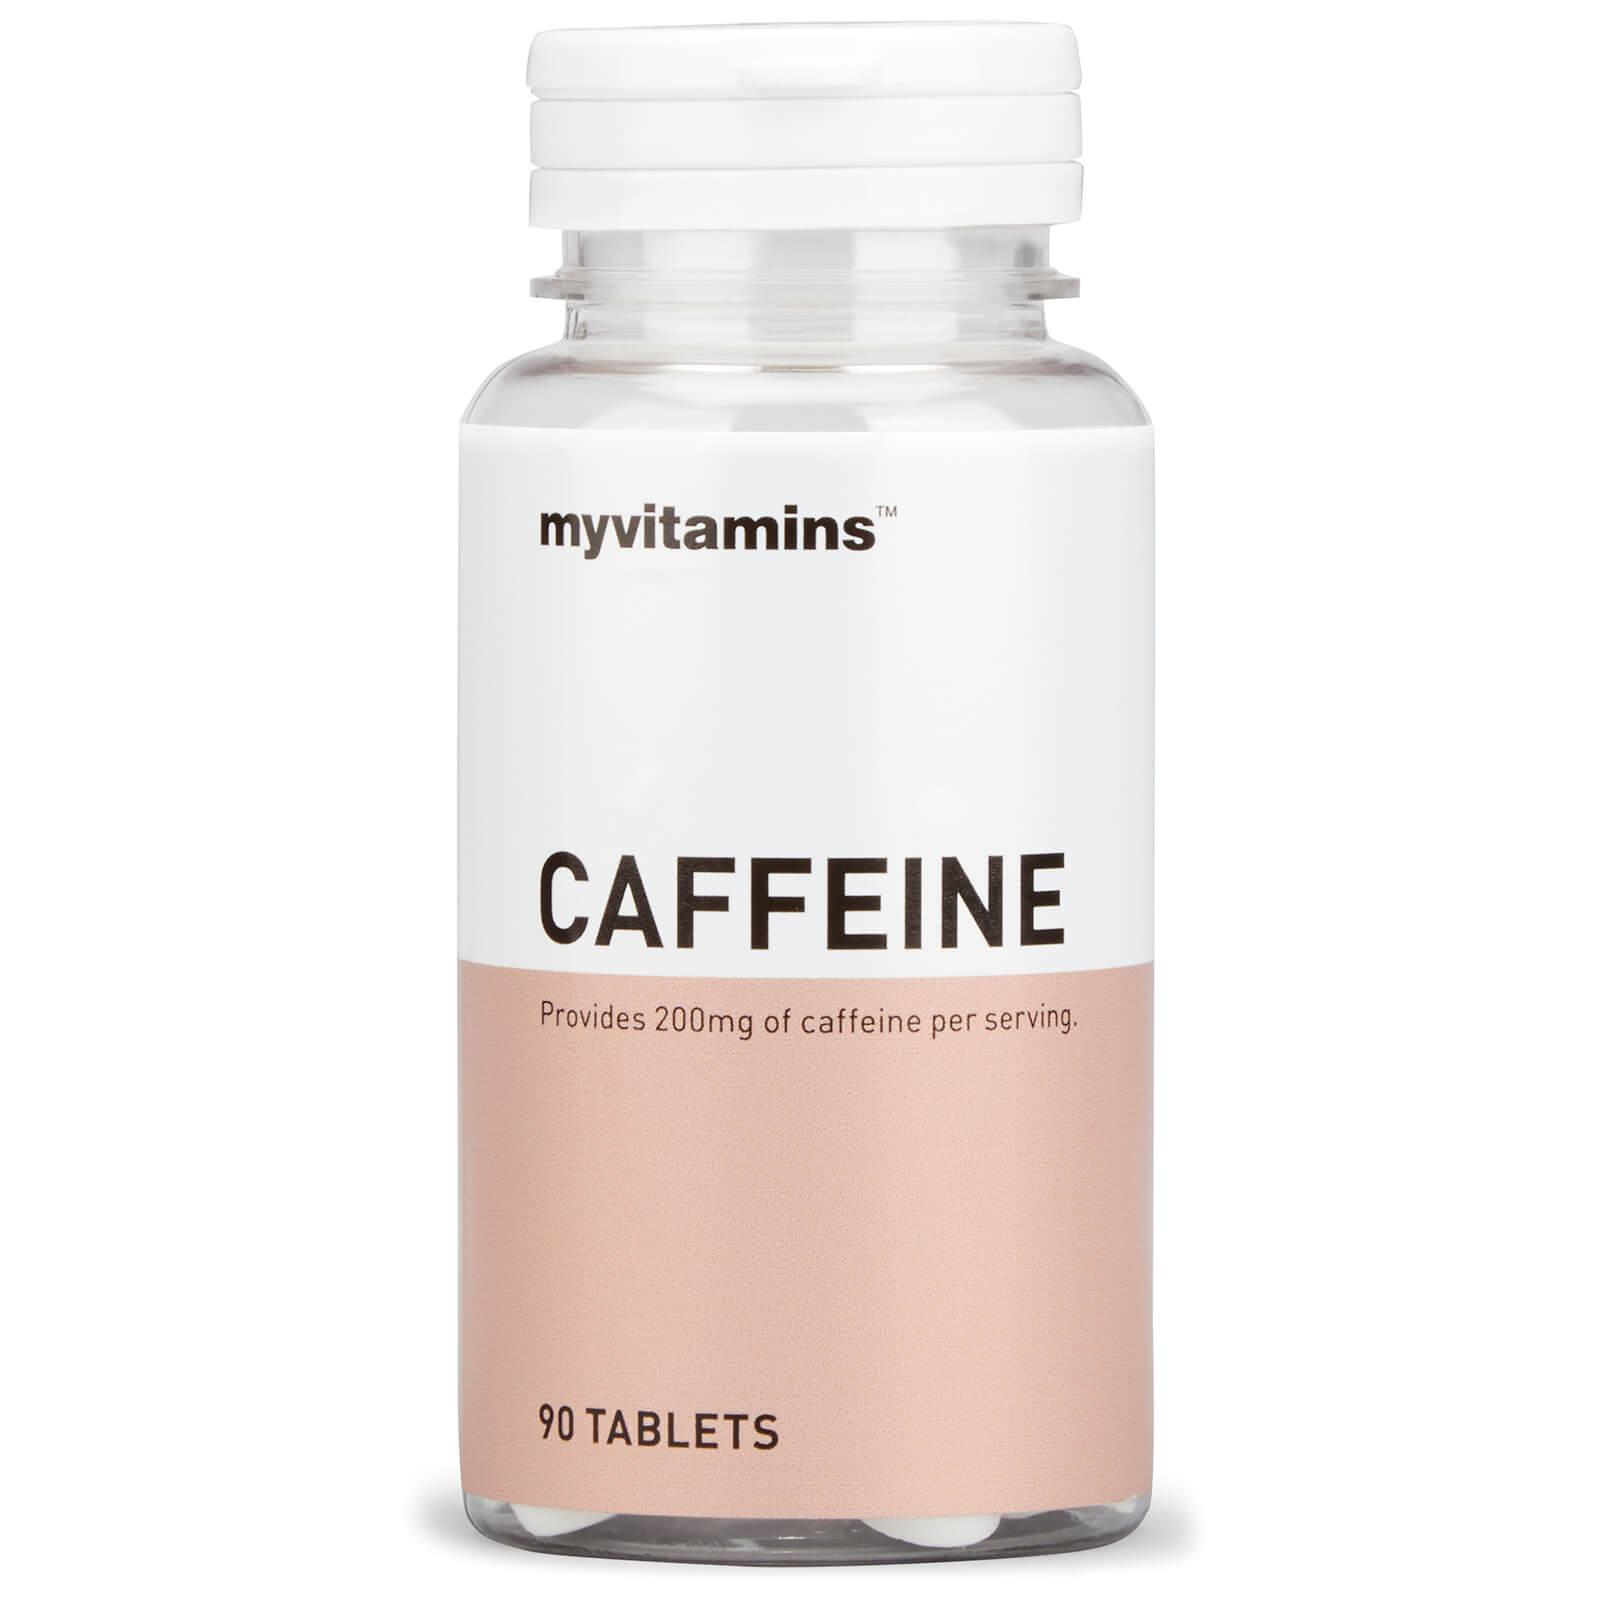 Image of Caffeine (30 Tablets) - Myvitamins 5056104501252